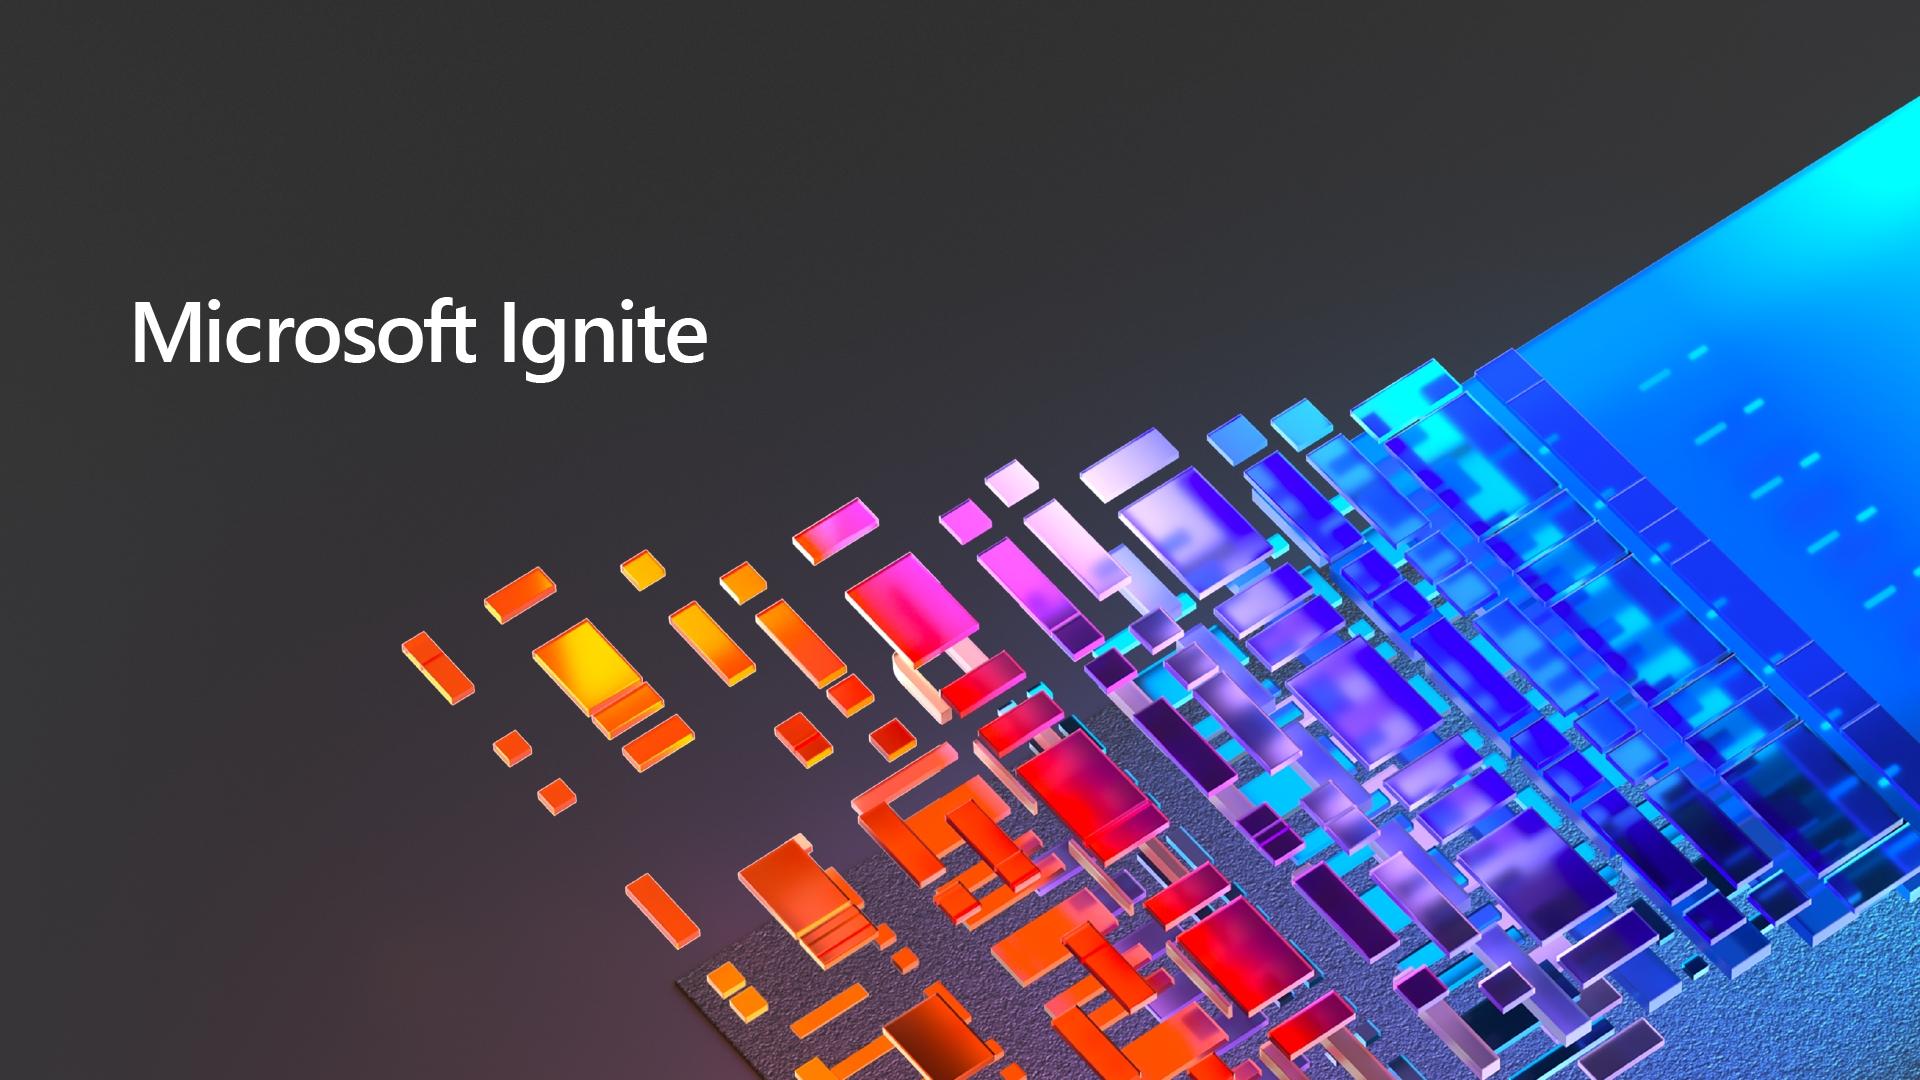 Microsoft Ignite 2020: Empowering Businesses To Build